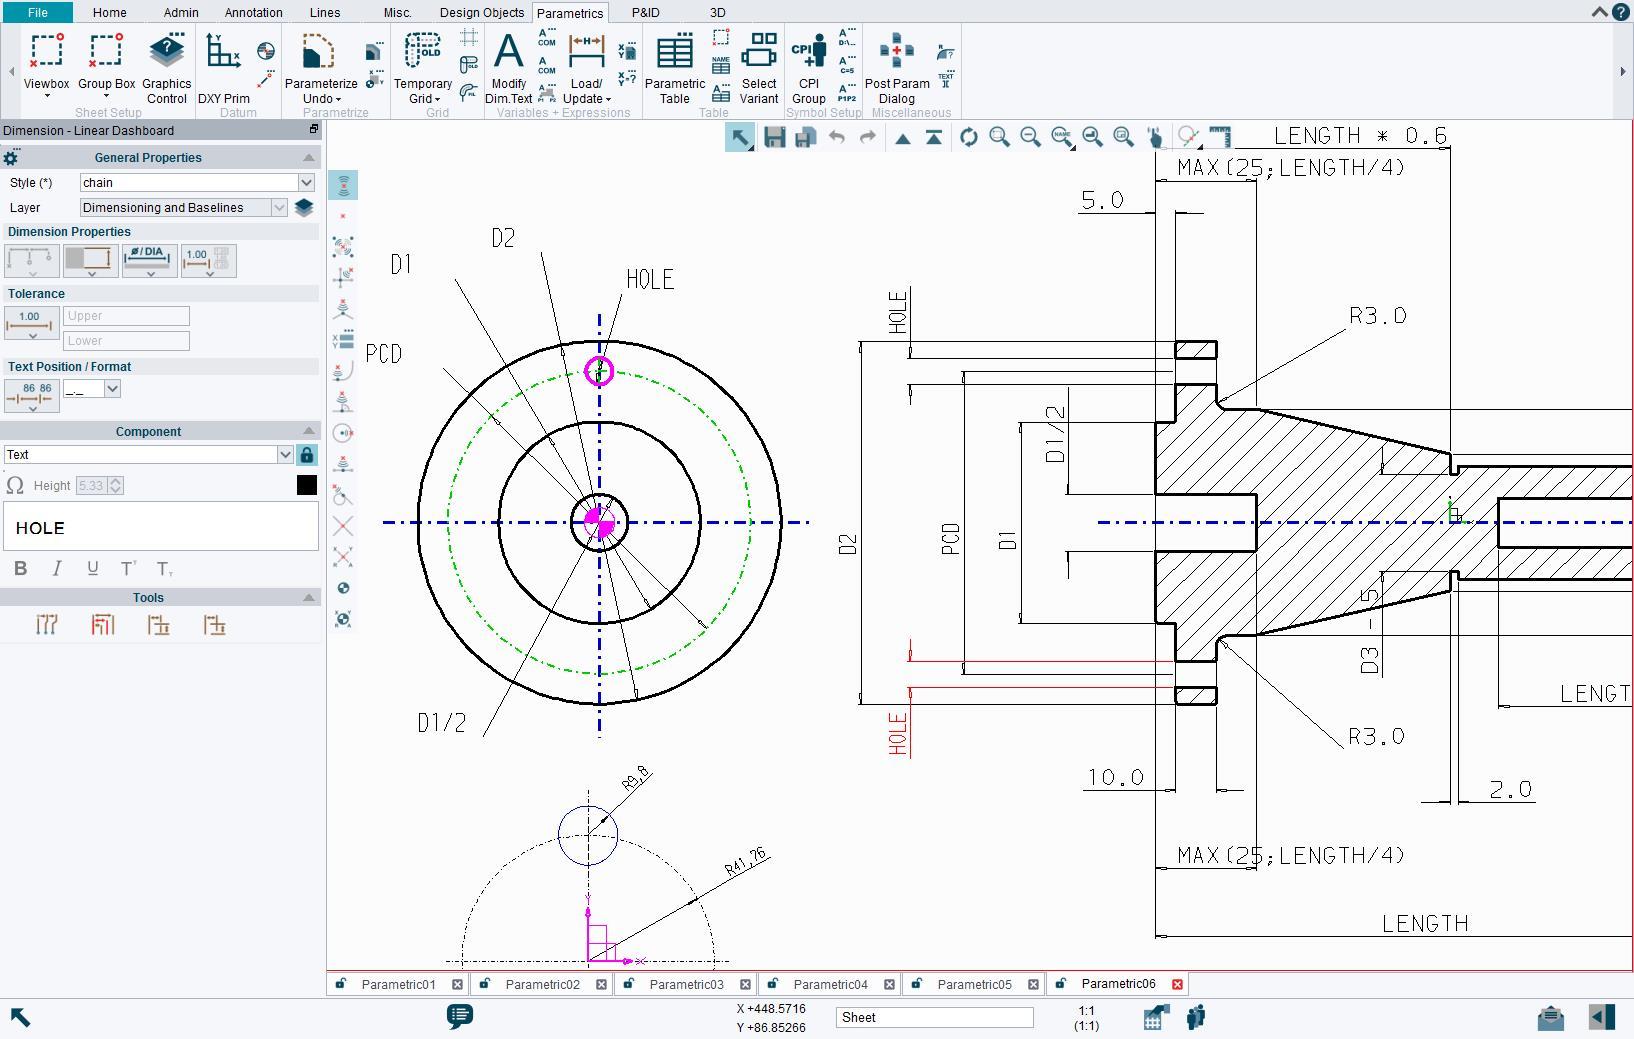 M4 DRAFTING-Parametric-CAD-06_en